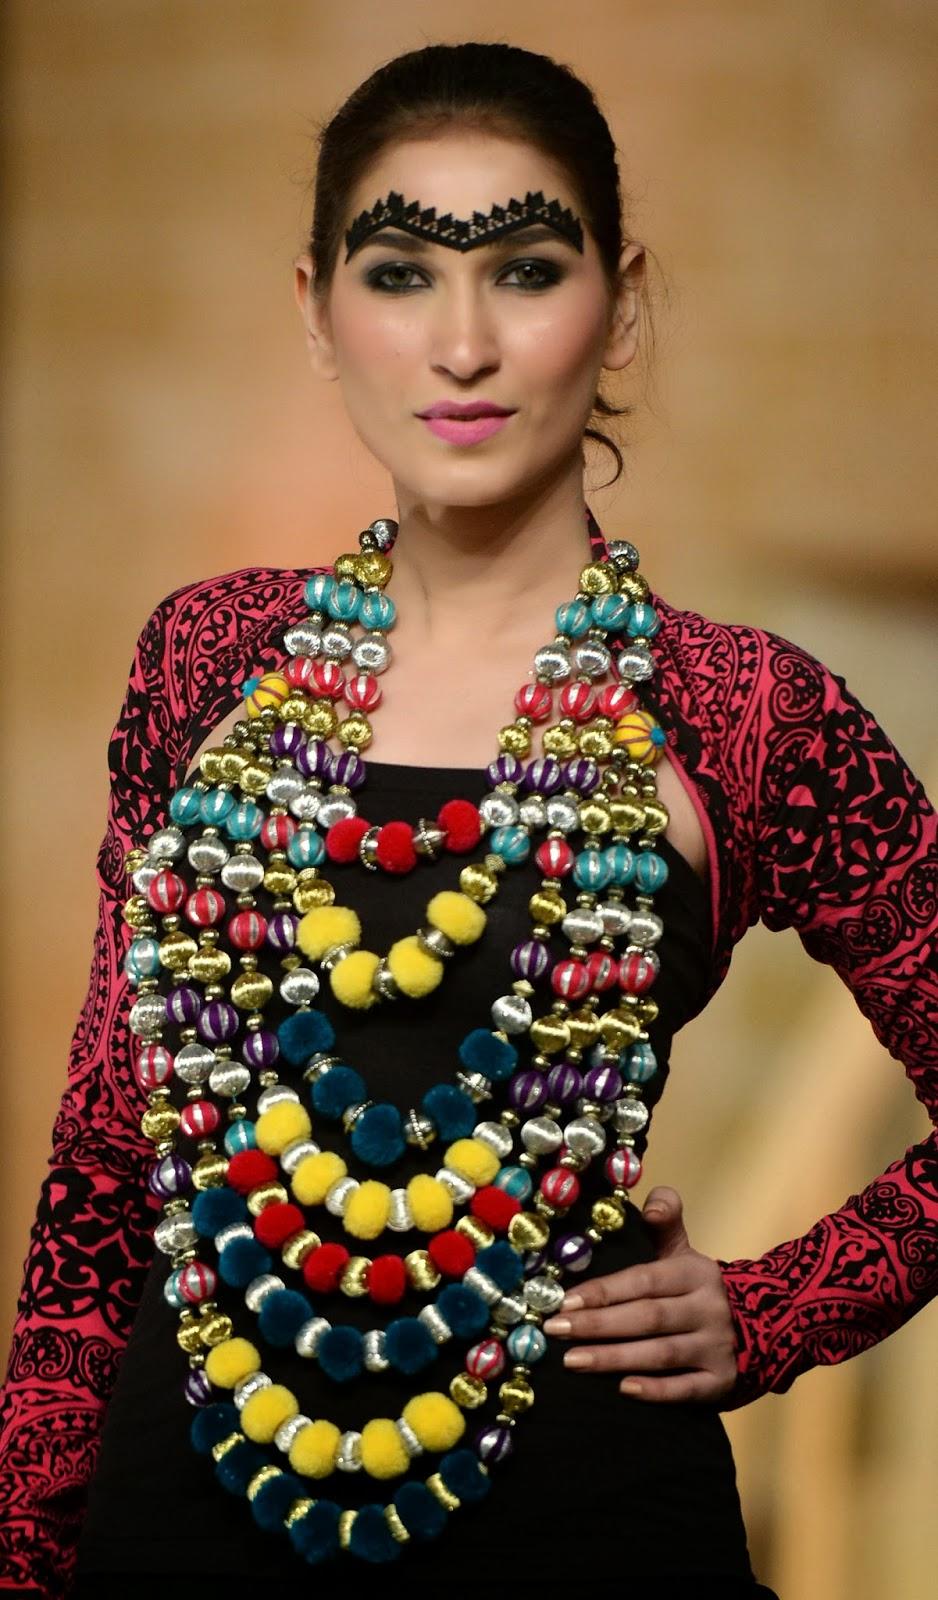 Benazir Bhutto, Bilawal Bhutto, Chairman, Culture, Fashion Show, FnkAsia, Government, Karachi, Model, Pakistan, Pakistan Peoples Party-PPP, Politician, Politics, Seth Ram Gopal, Showbiz, Sindh, Sindh Festival, Zardari,